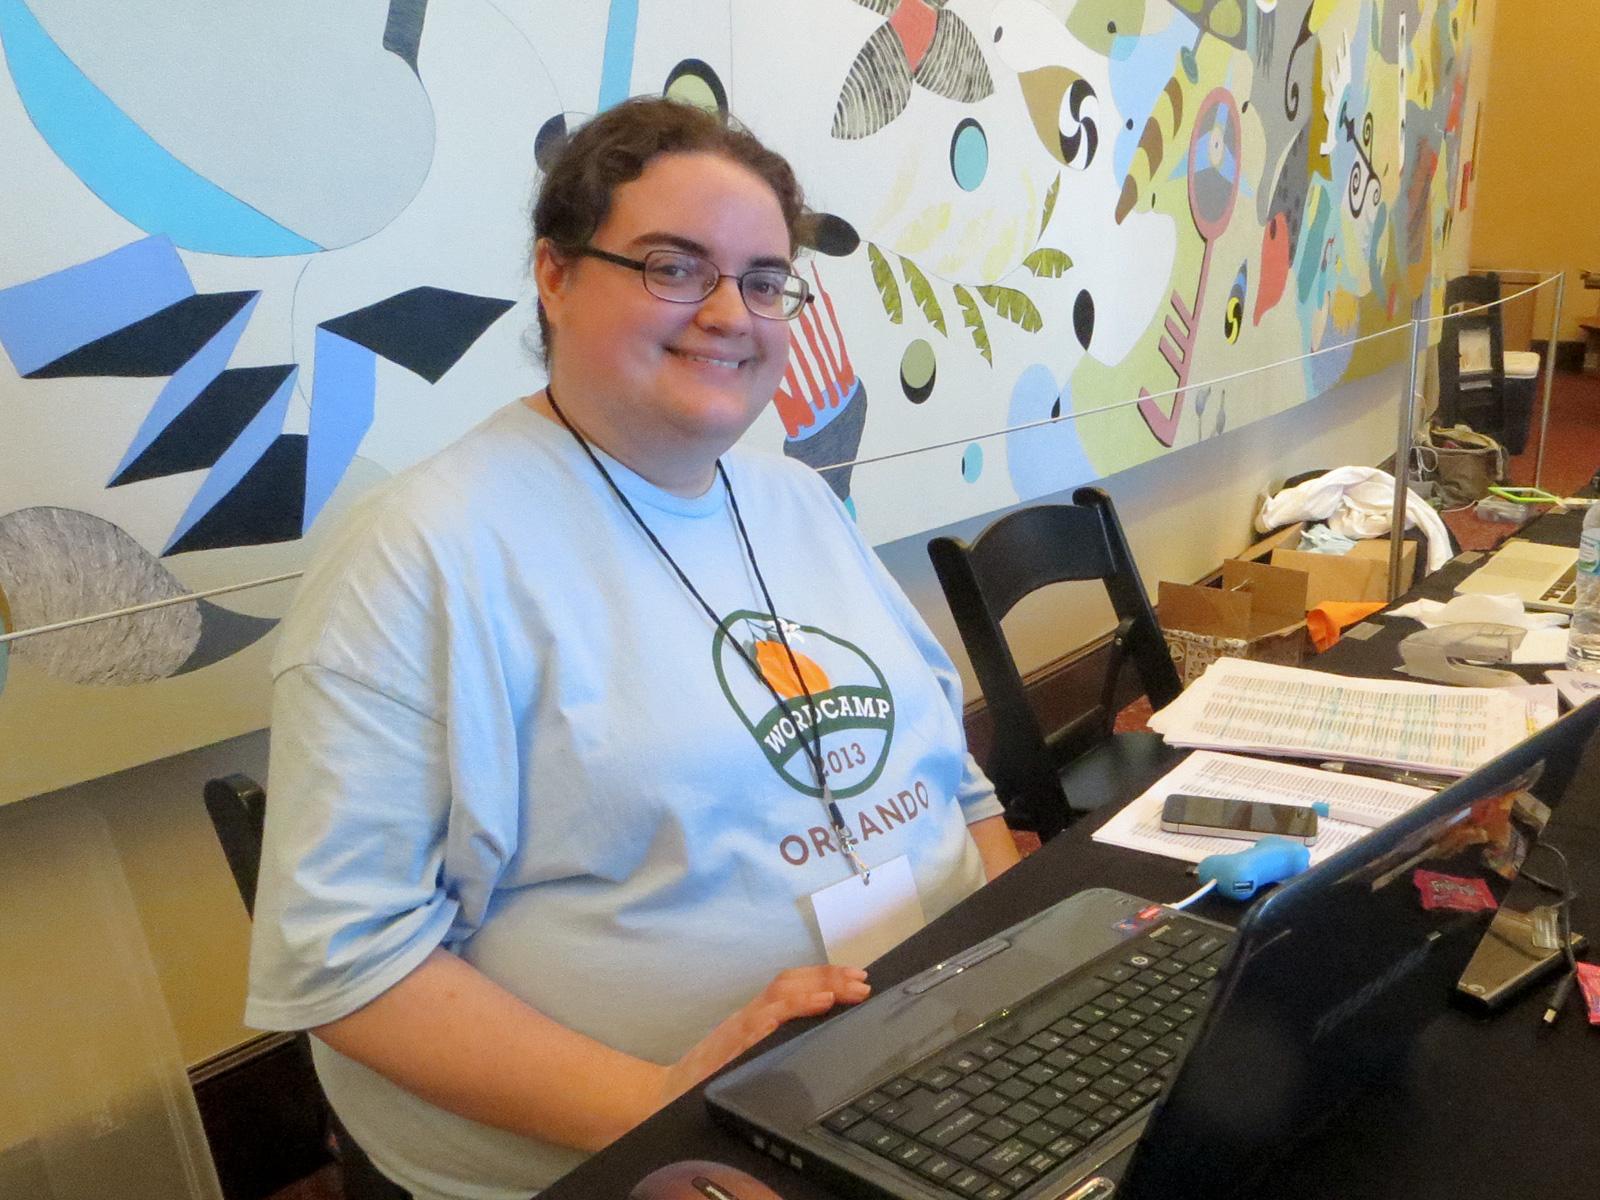 WordCamp Orlando 2013 Registration Volunteer